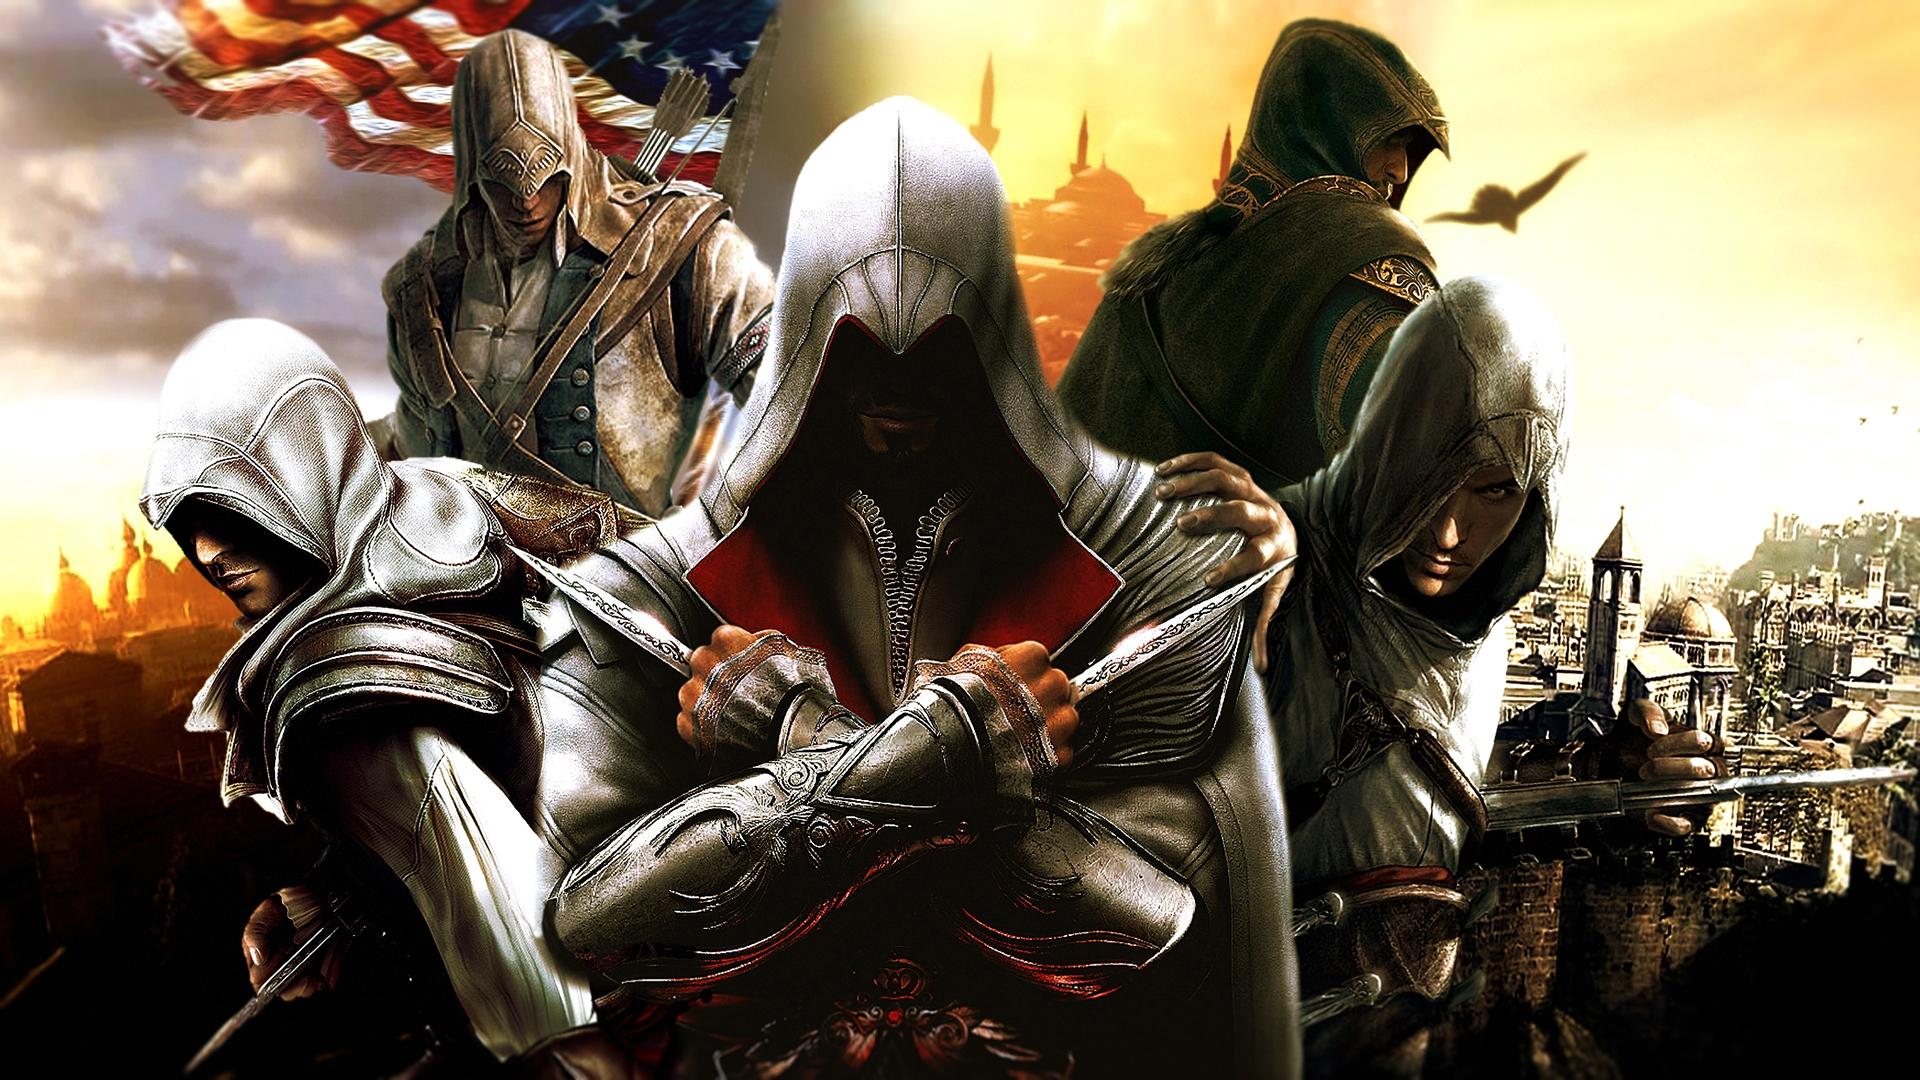 Assassins Creed assassins creed 30820342 1920 1080jpg 1920x1080